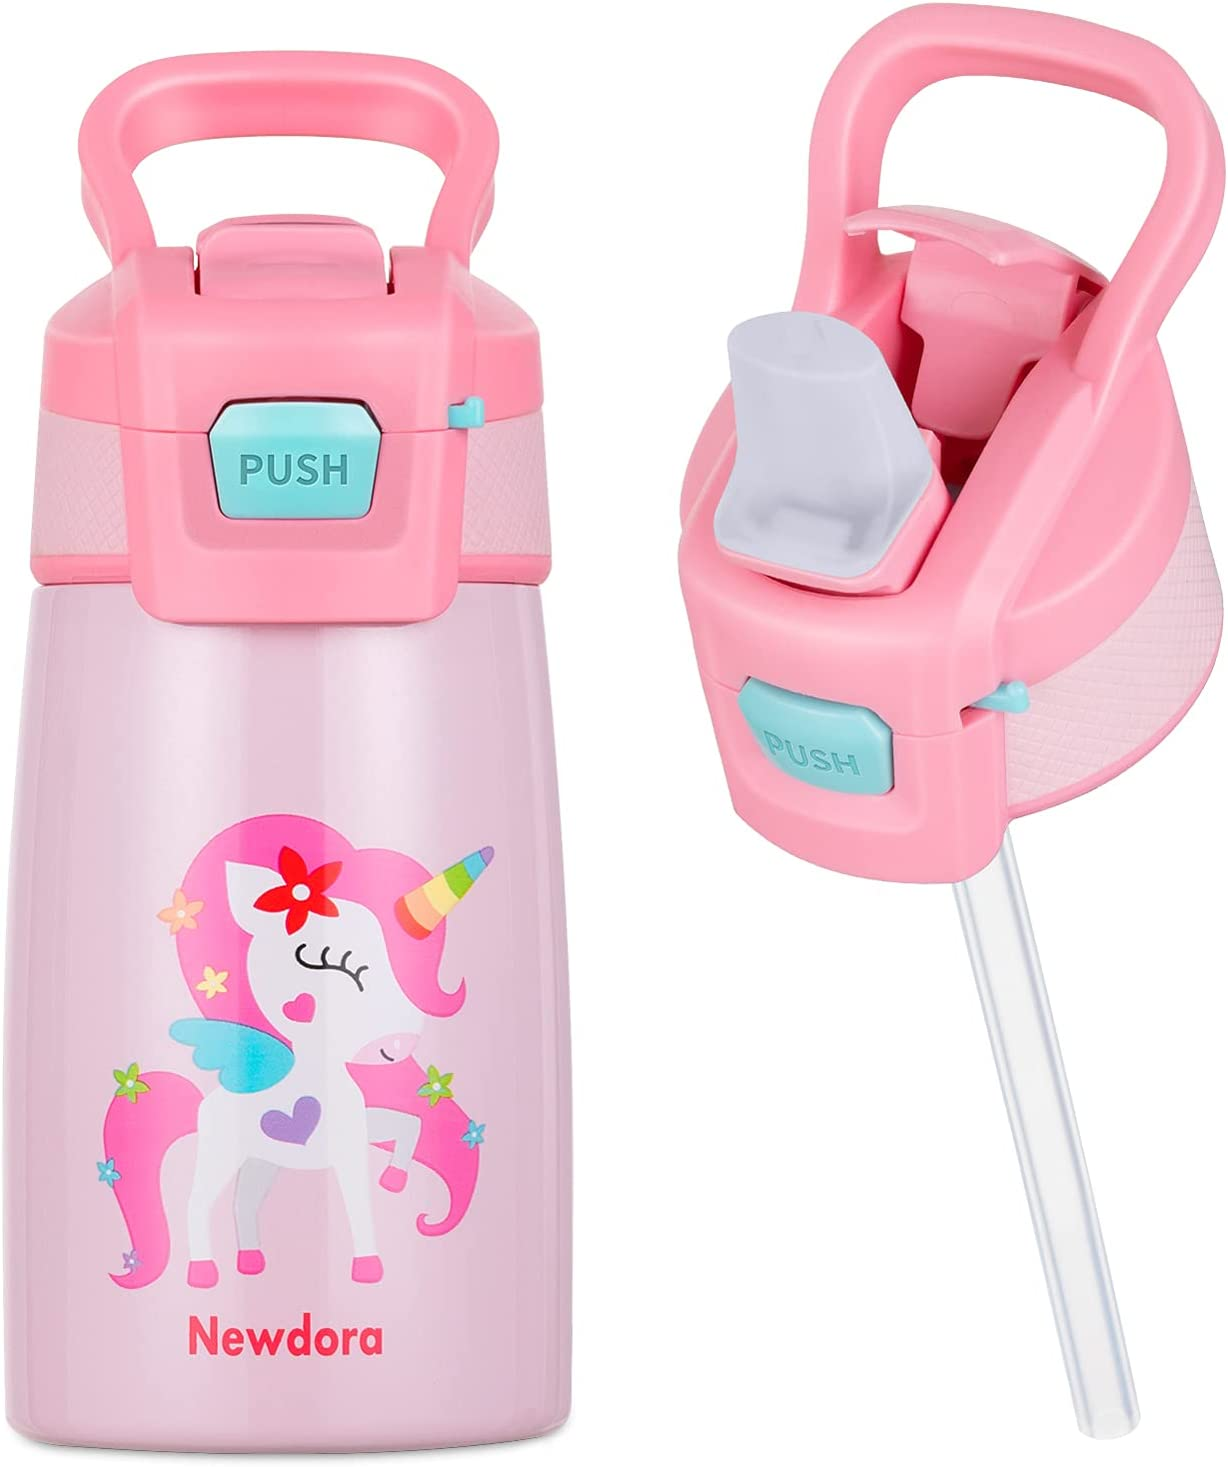 Newdora Botella de Agua para Niños, 350ml Botella Termica a Prueba de Fugas, Termo con Pajitas, Acero Inoxidable de Doble Pared al Vacio